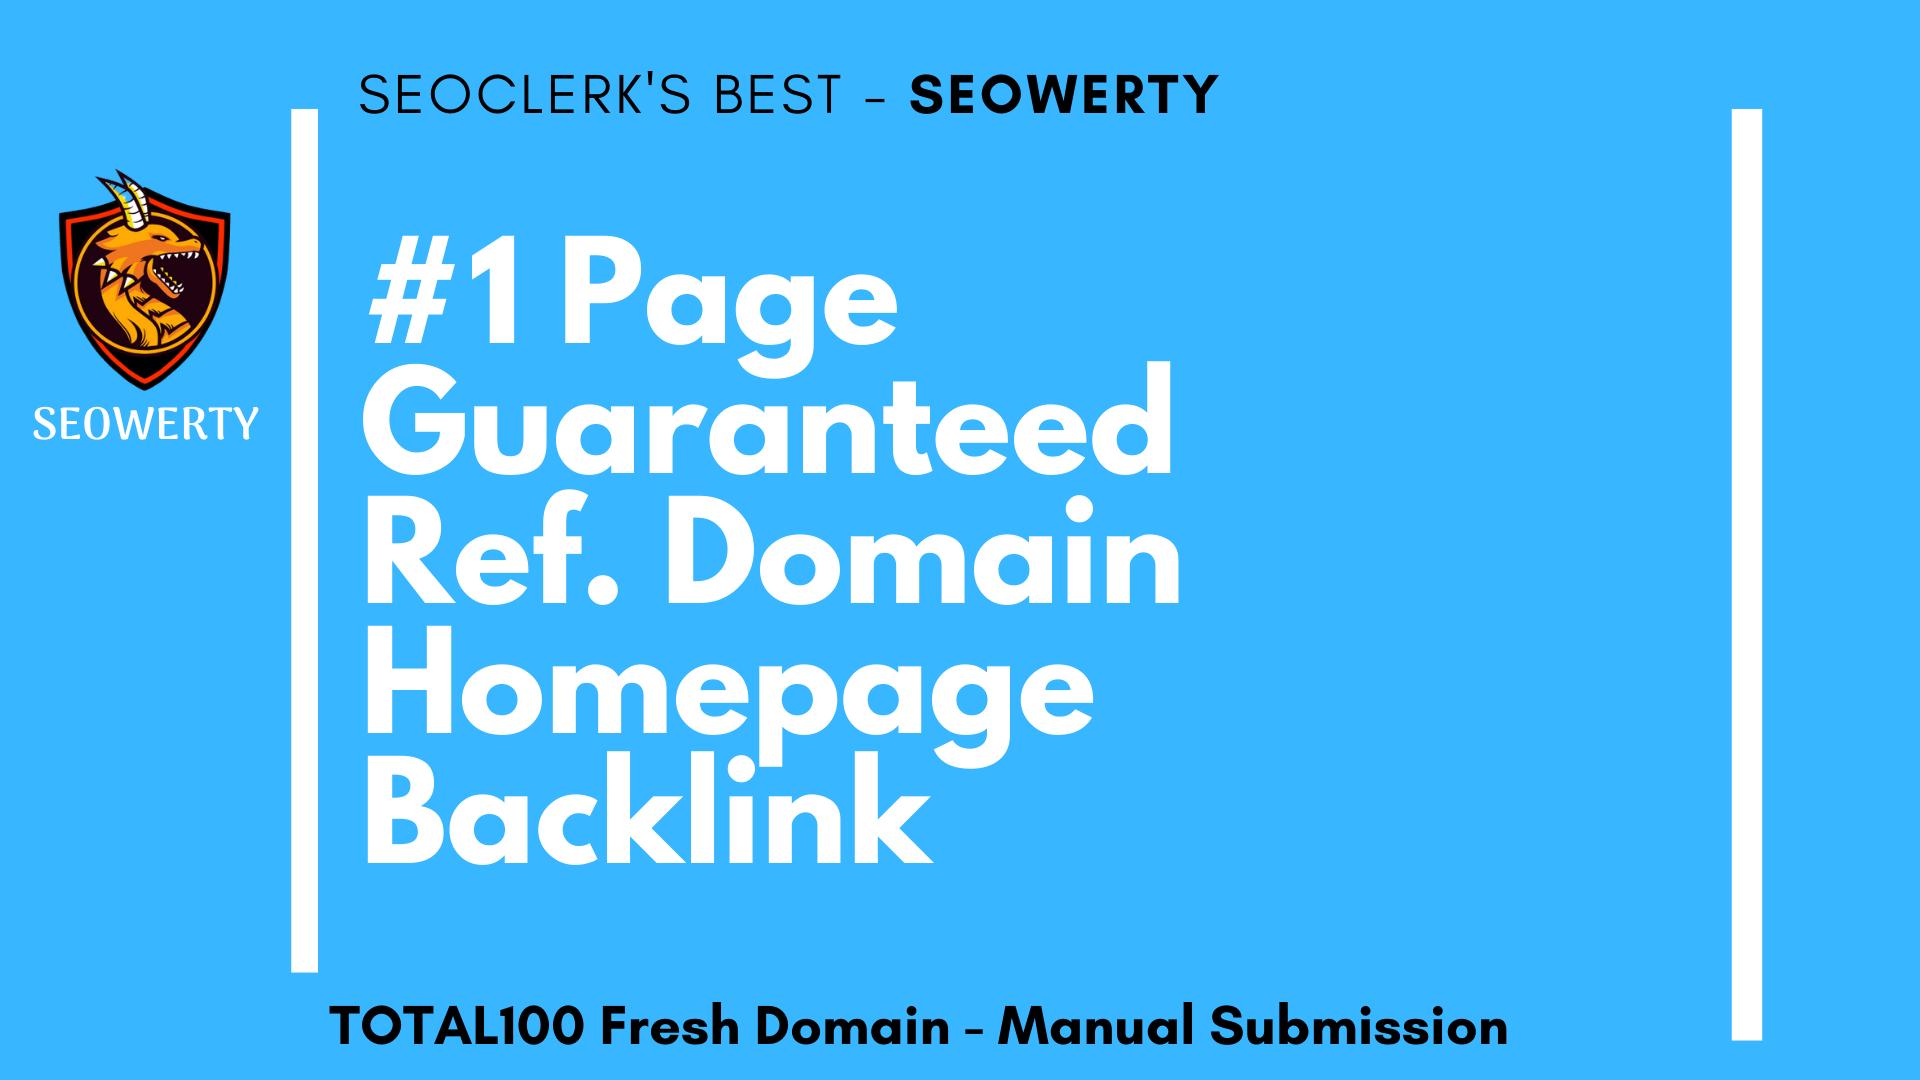 1 Page Guaranteed Ref. Domain Homepage PBN Backlink